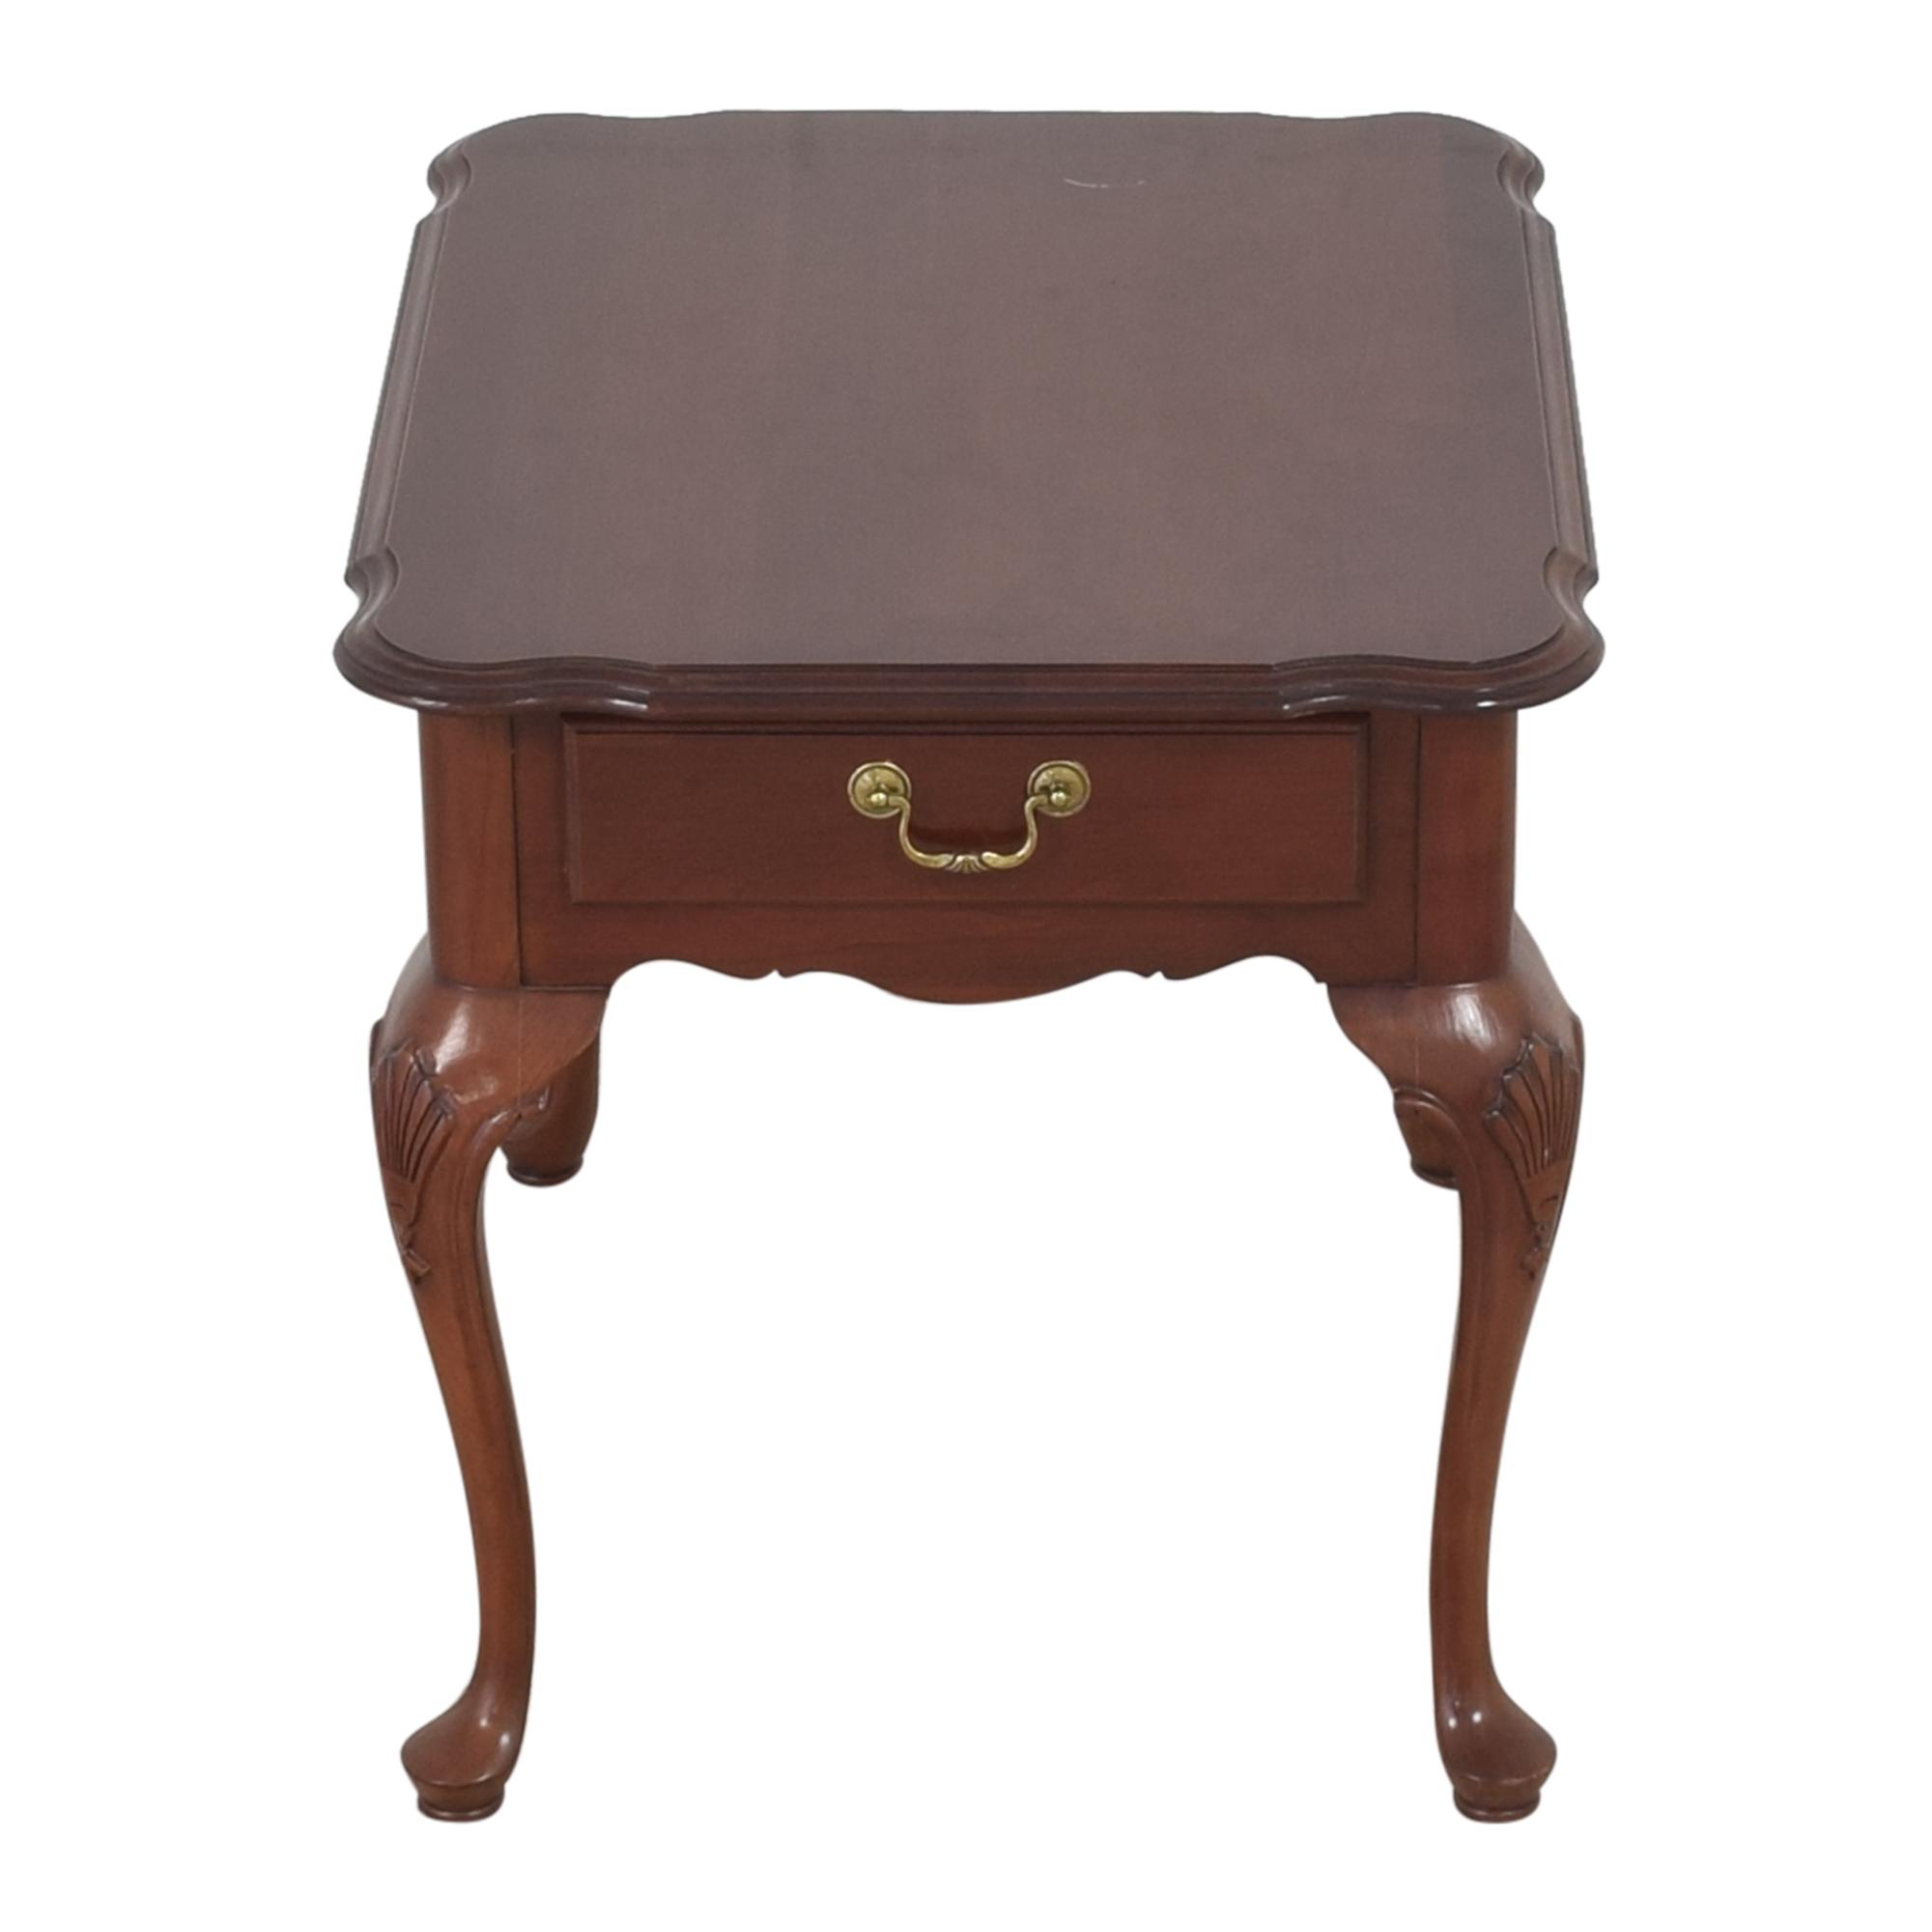 Ethan Allen Ethan Allen Queen Anne End Table nj